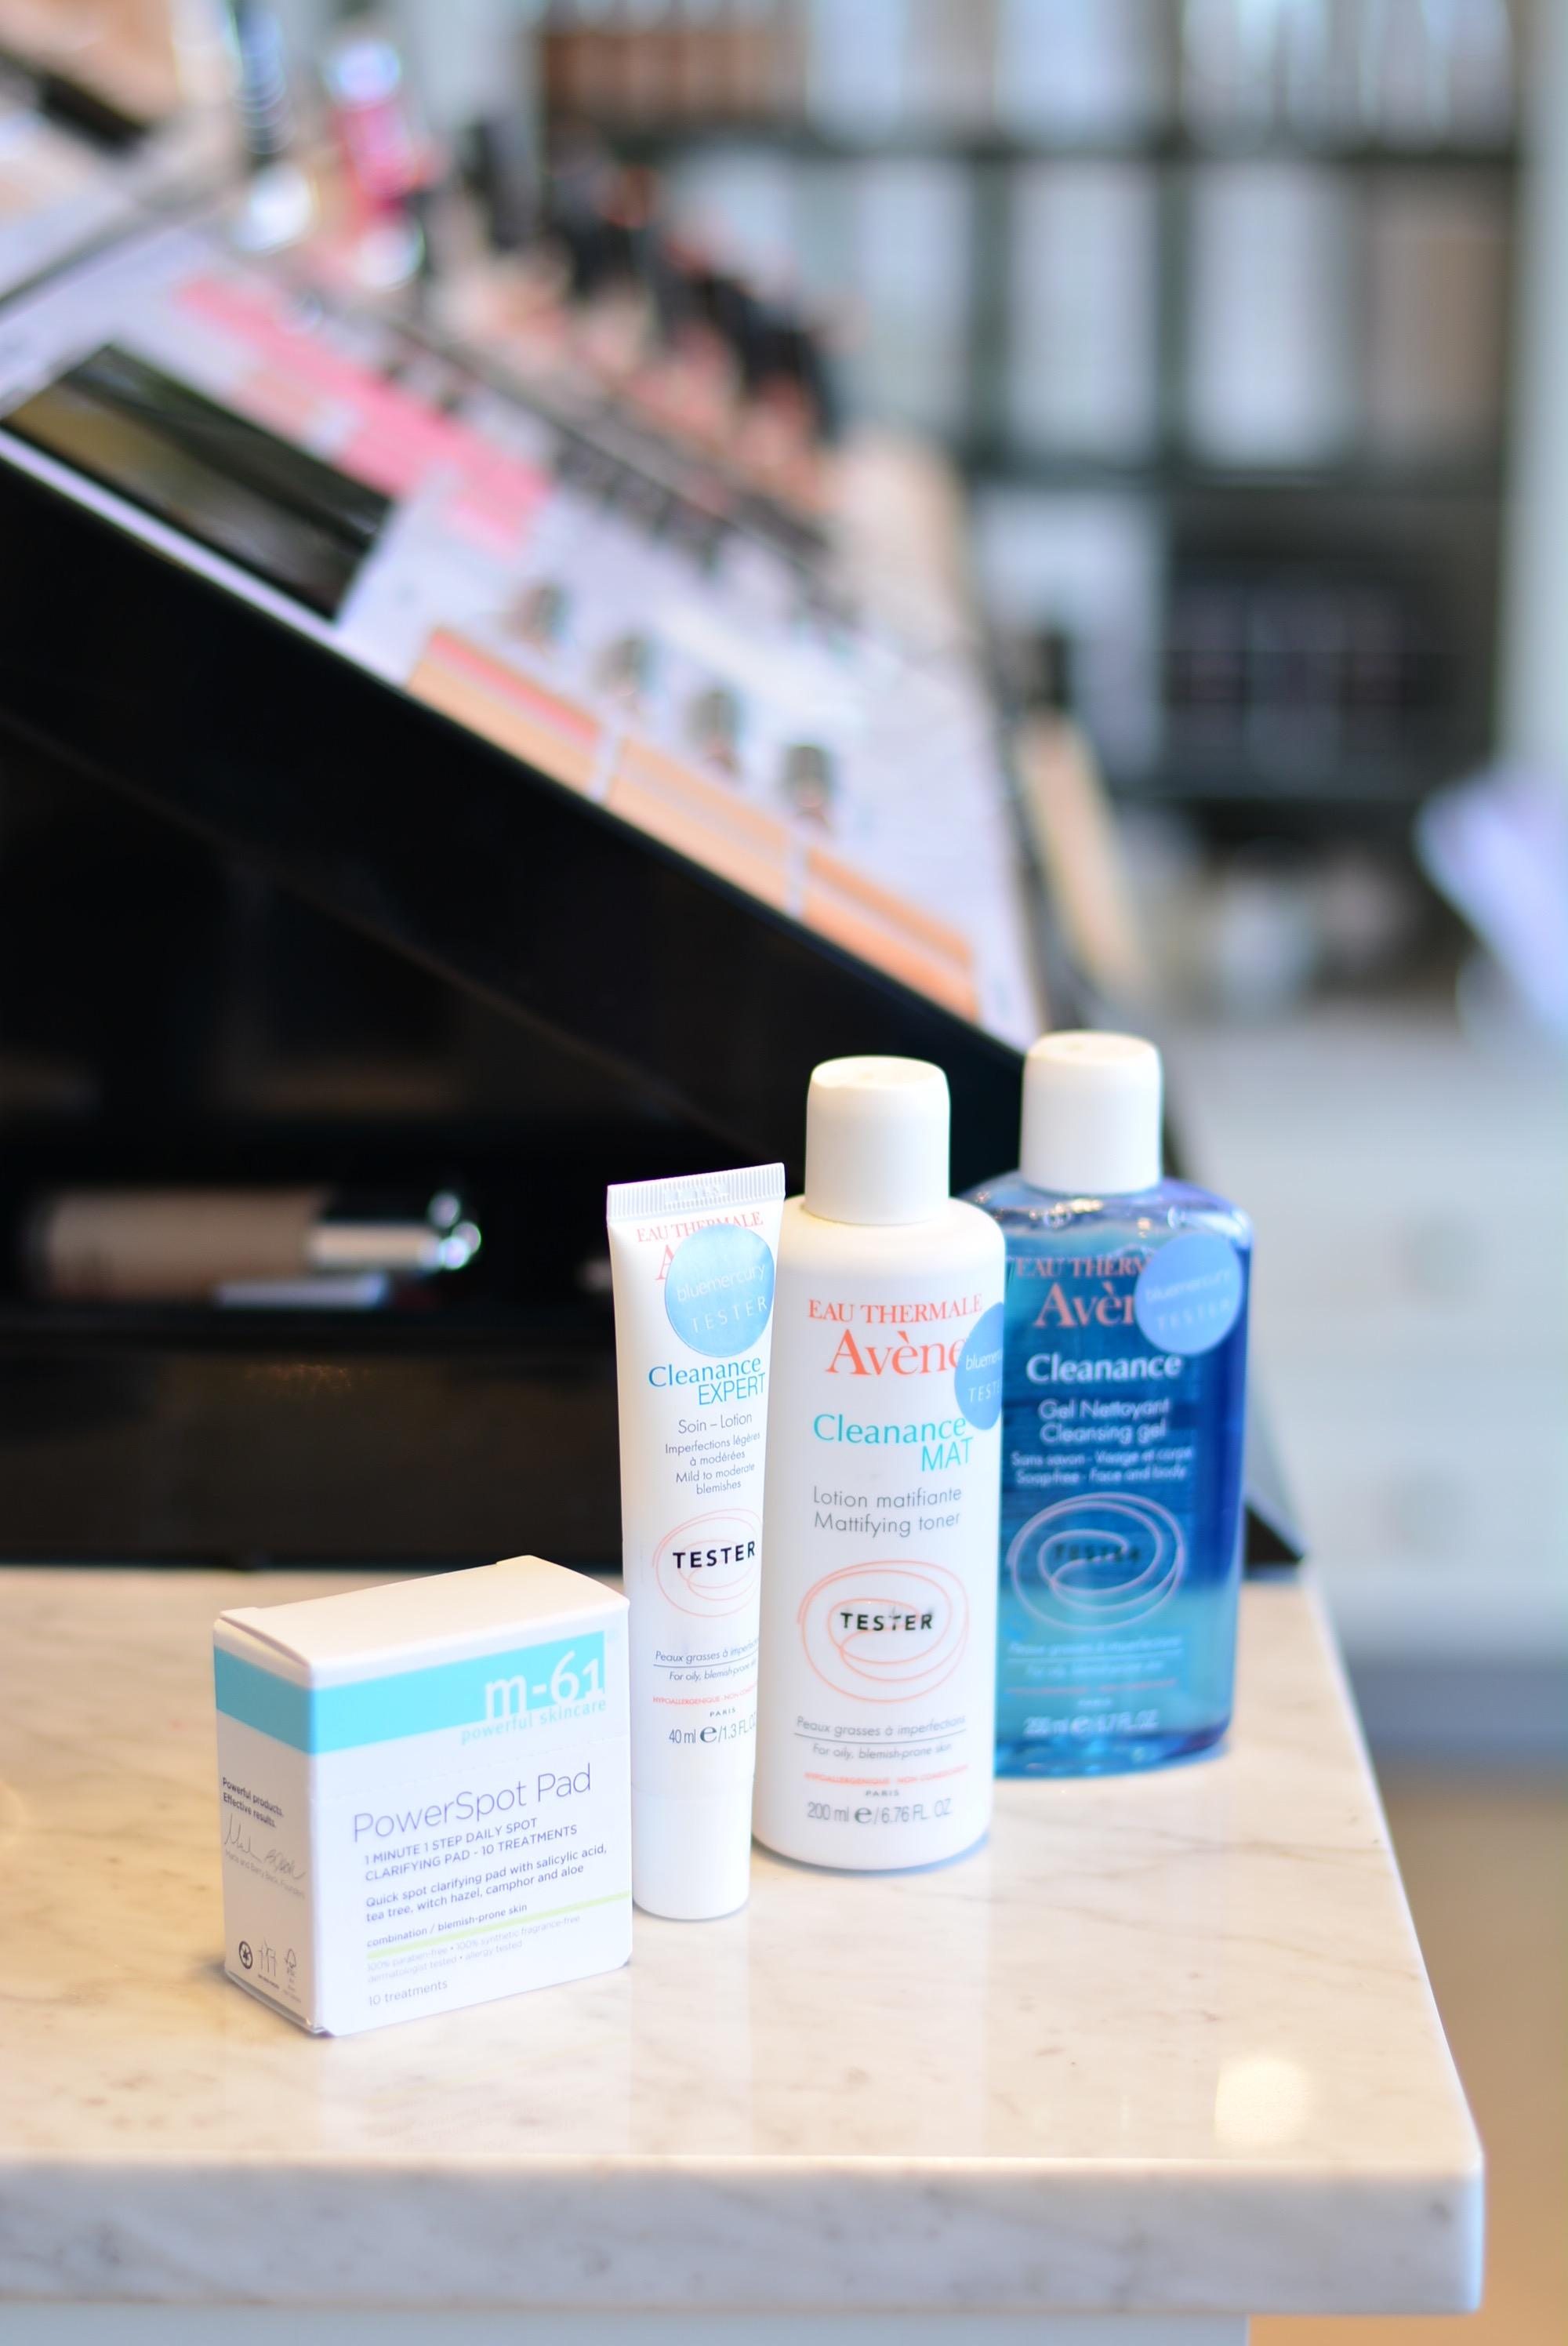 Acne skin care at Bluemercury